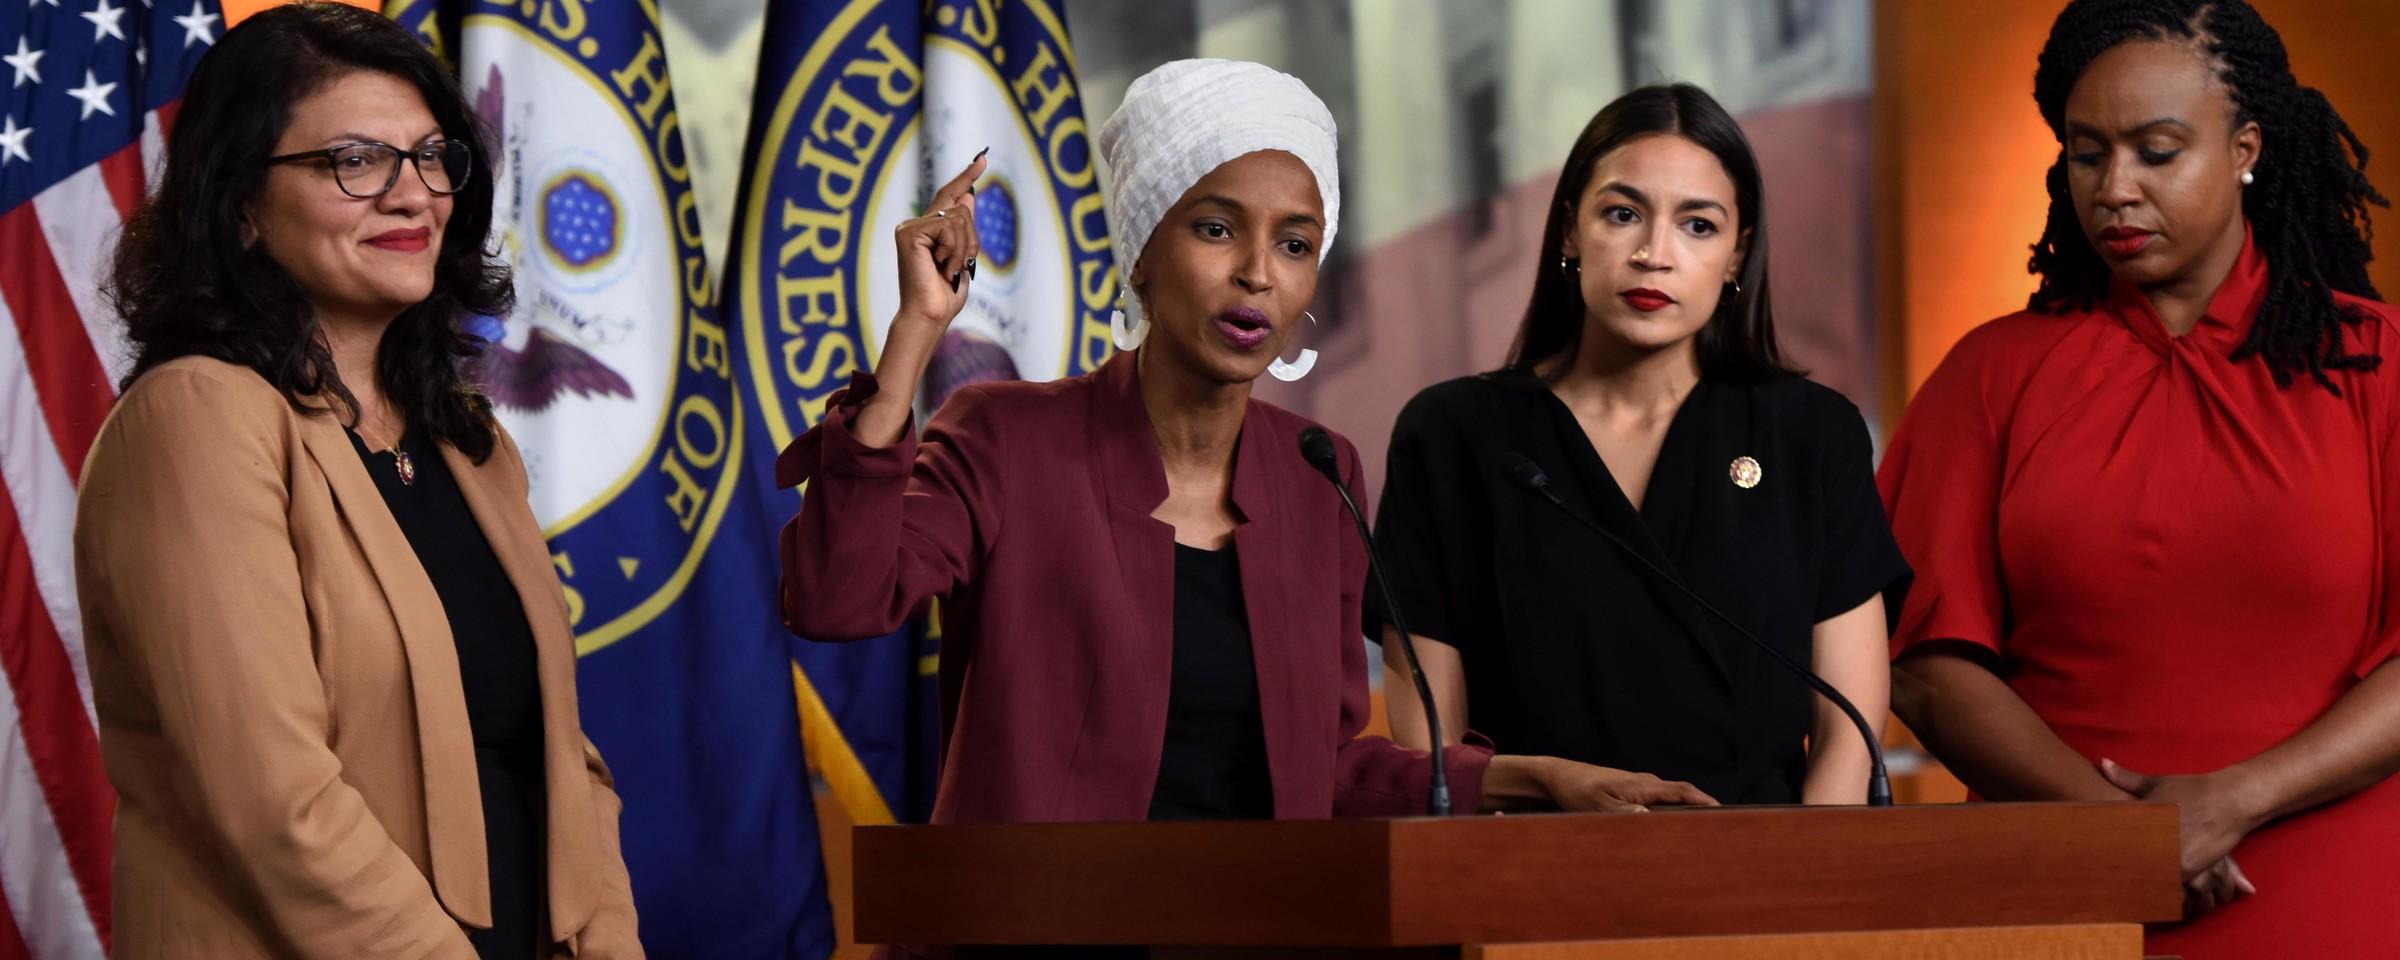 Three women stand around a fourth speaking at podium